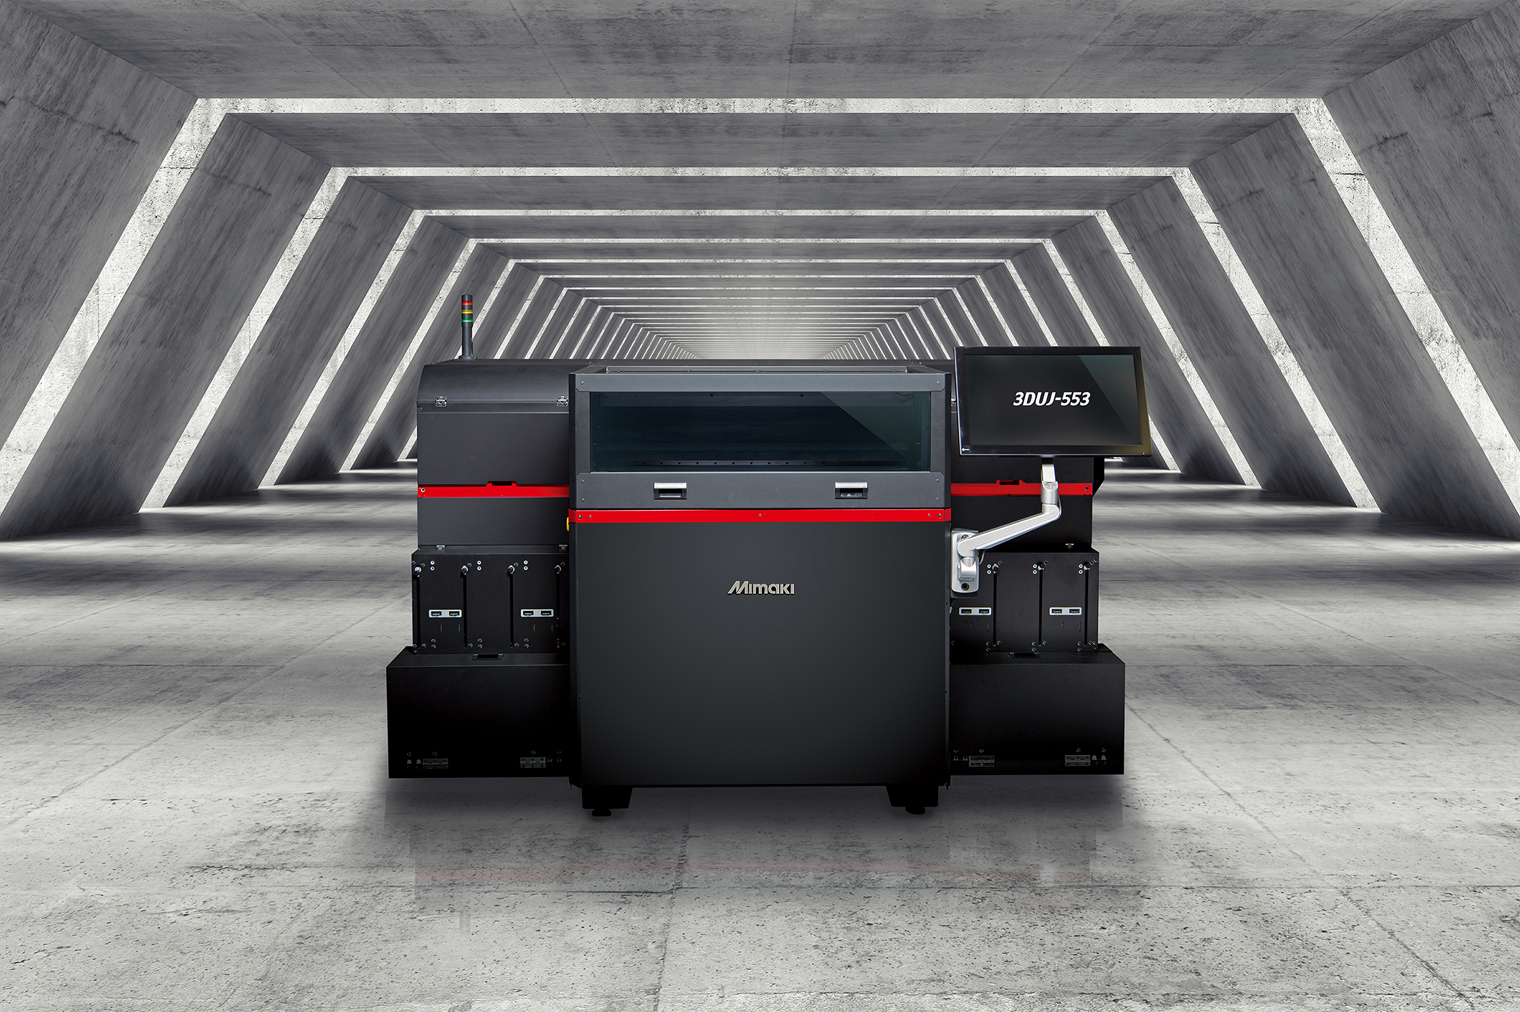 The Mimaki 3DUJ-553 full color 3D printer. Image via Mimaki